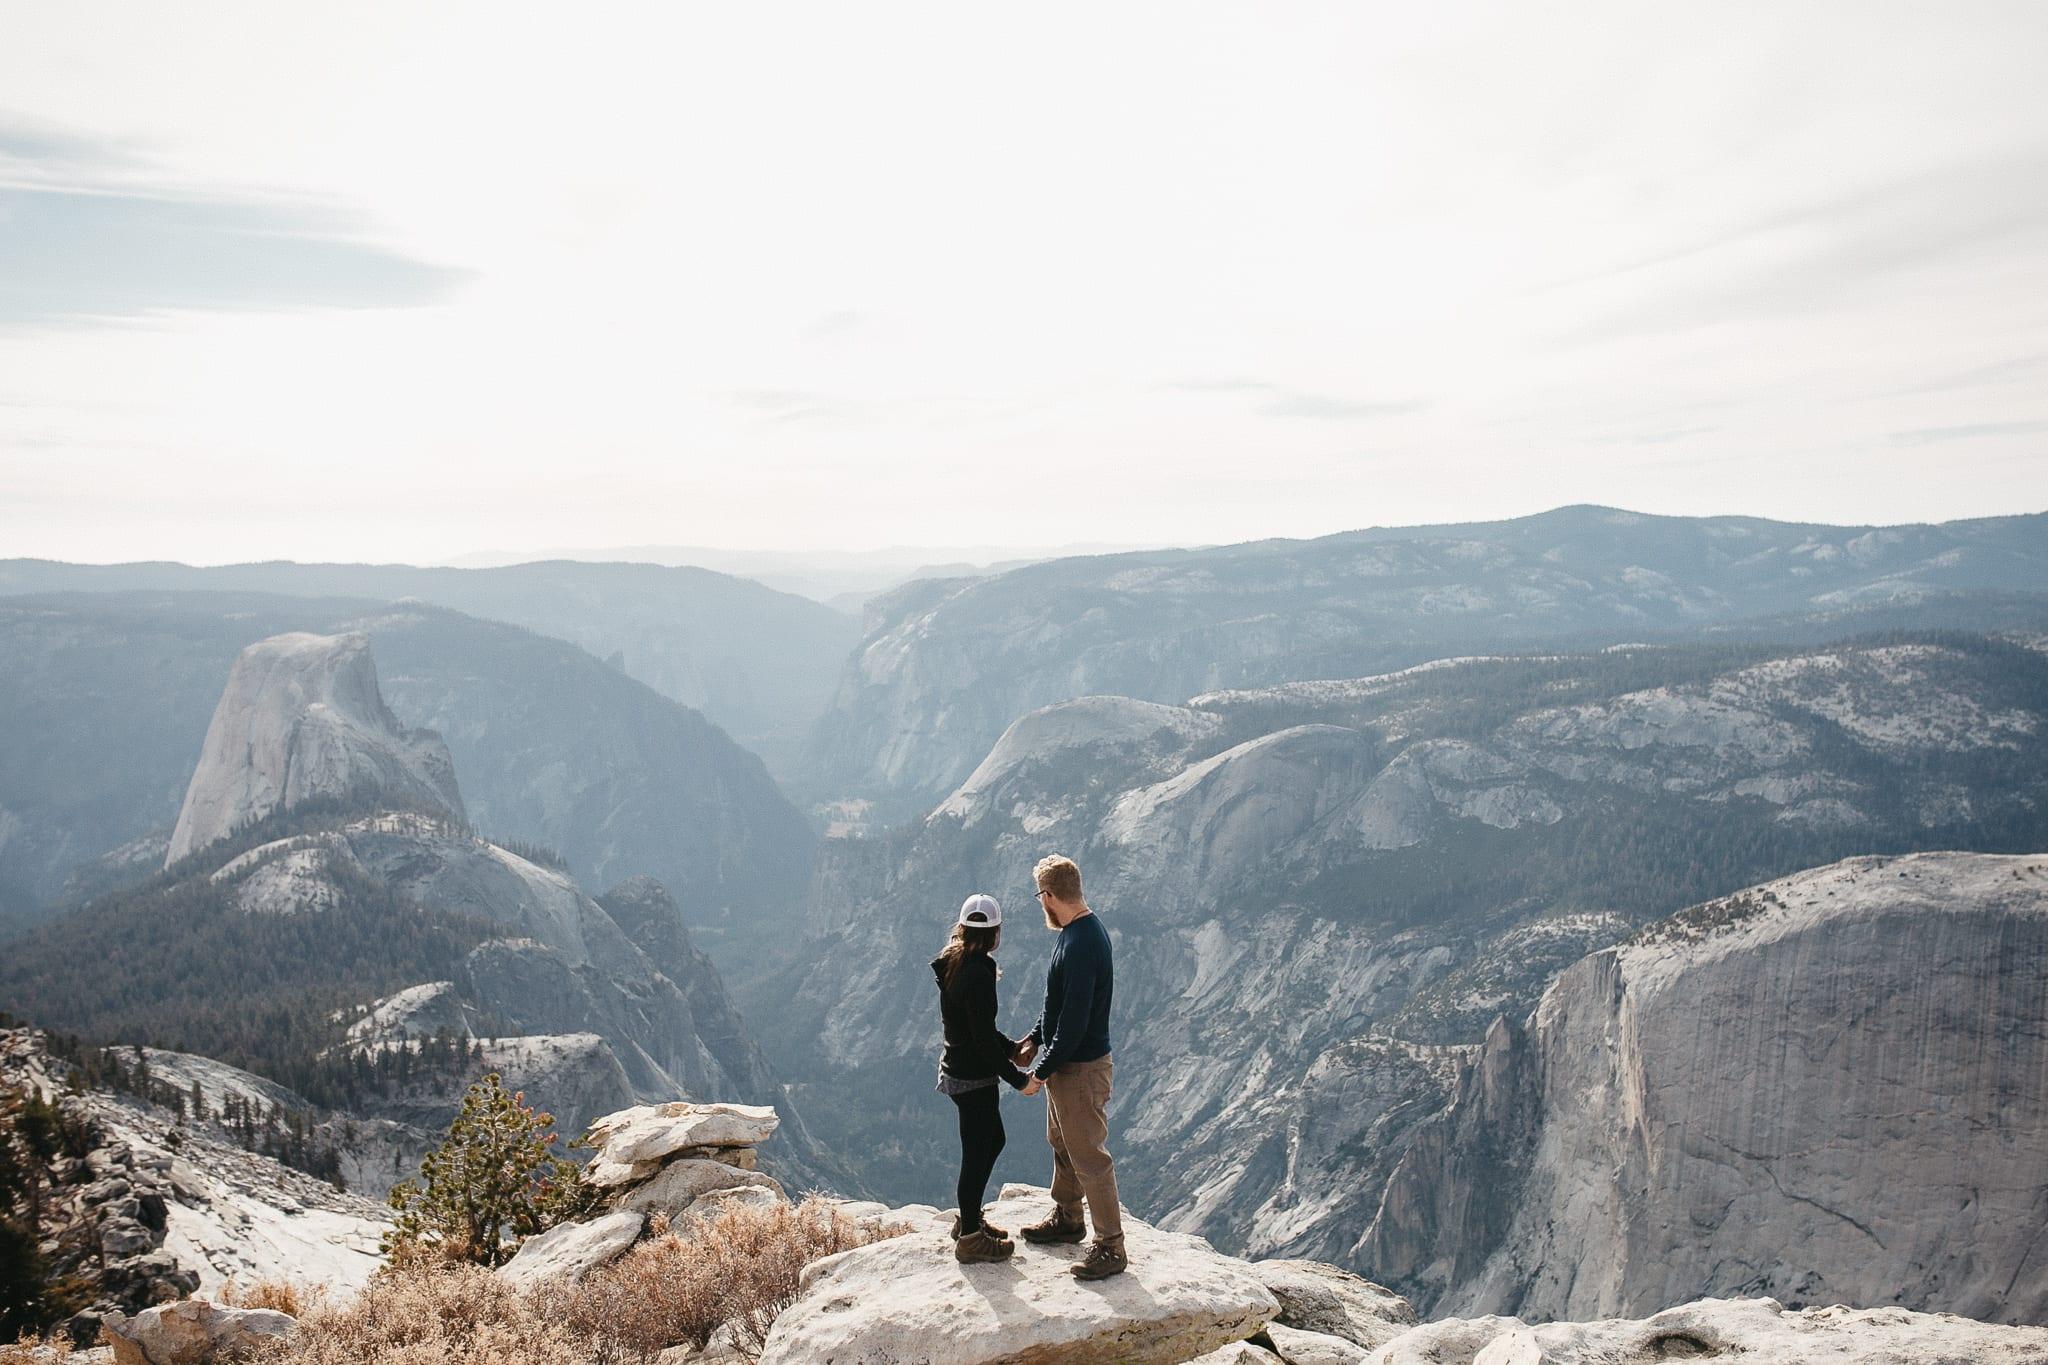 clouds-rest-yosemite-california-engagement-lifestyle-adventure-photographer-22